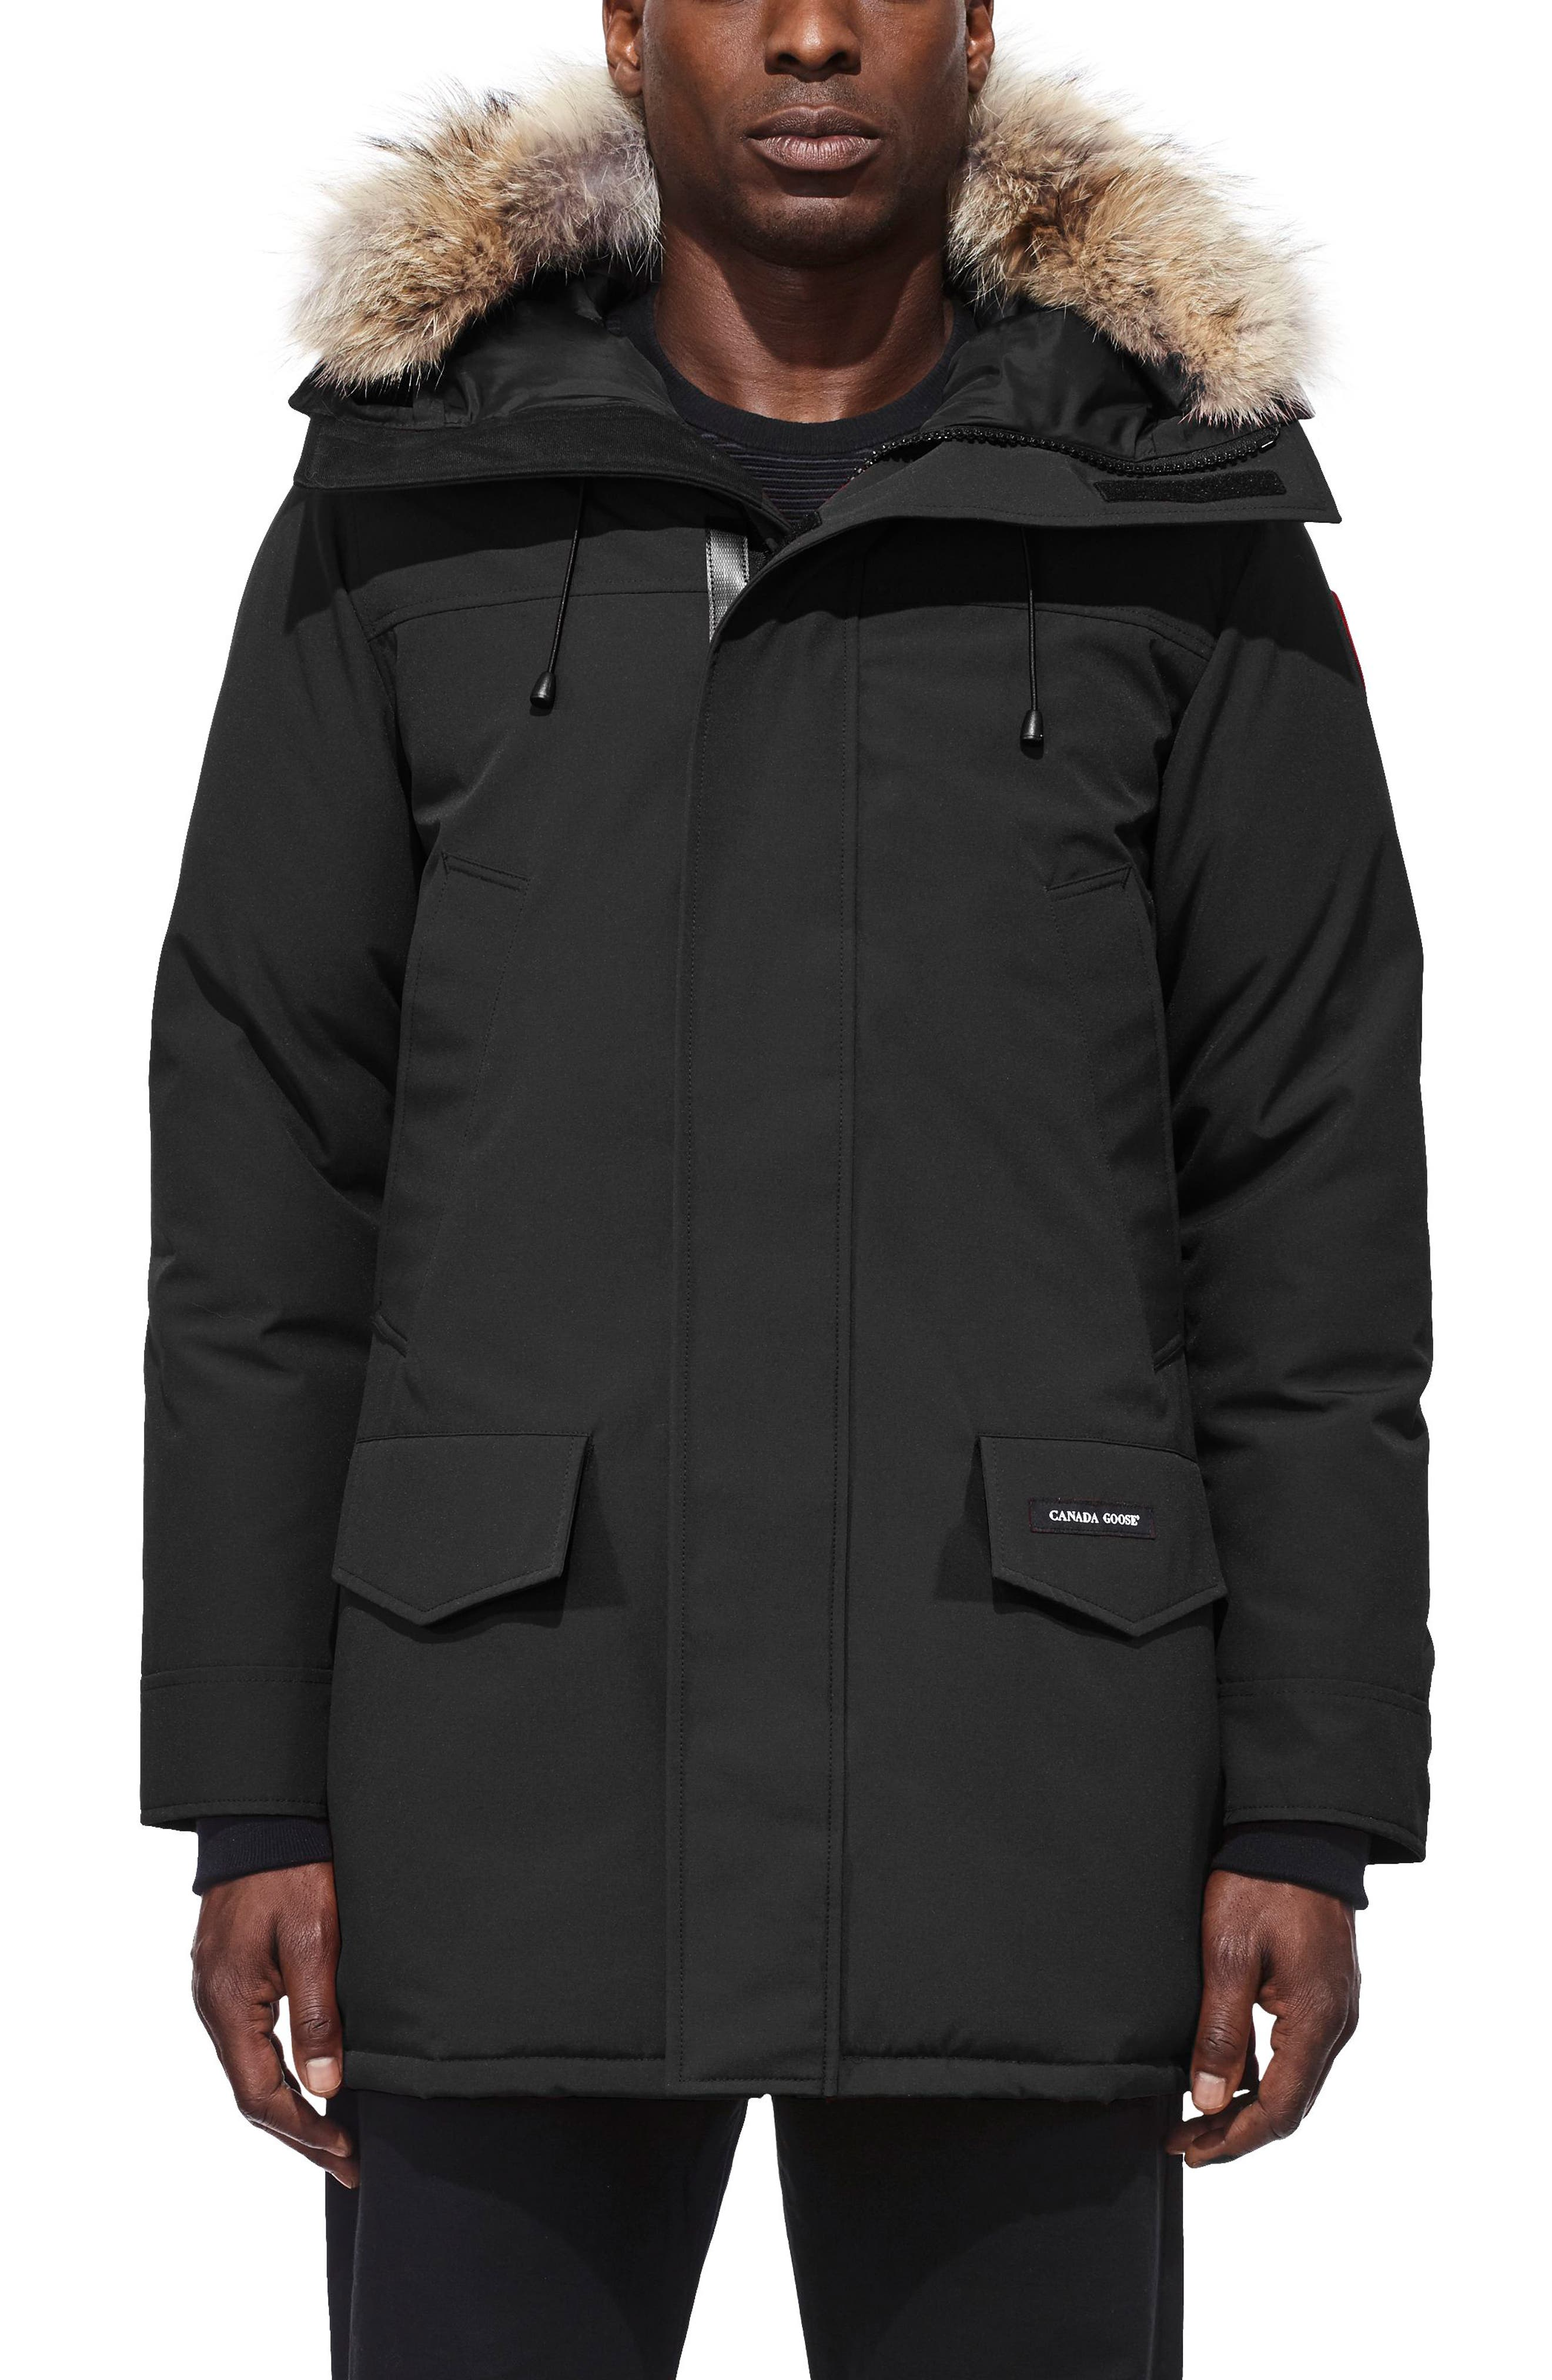 CANADA GOOSE Langford Slim Fit Down Parka with Genuine Coyote Fur Trim, Main, color, BLACK